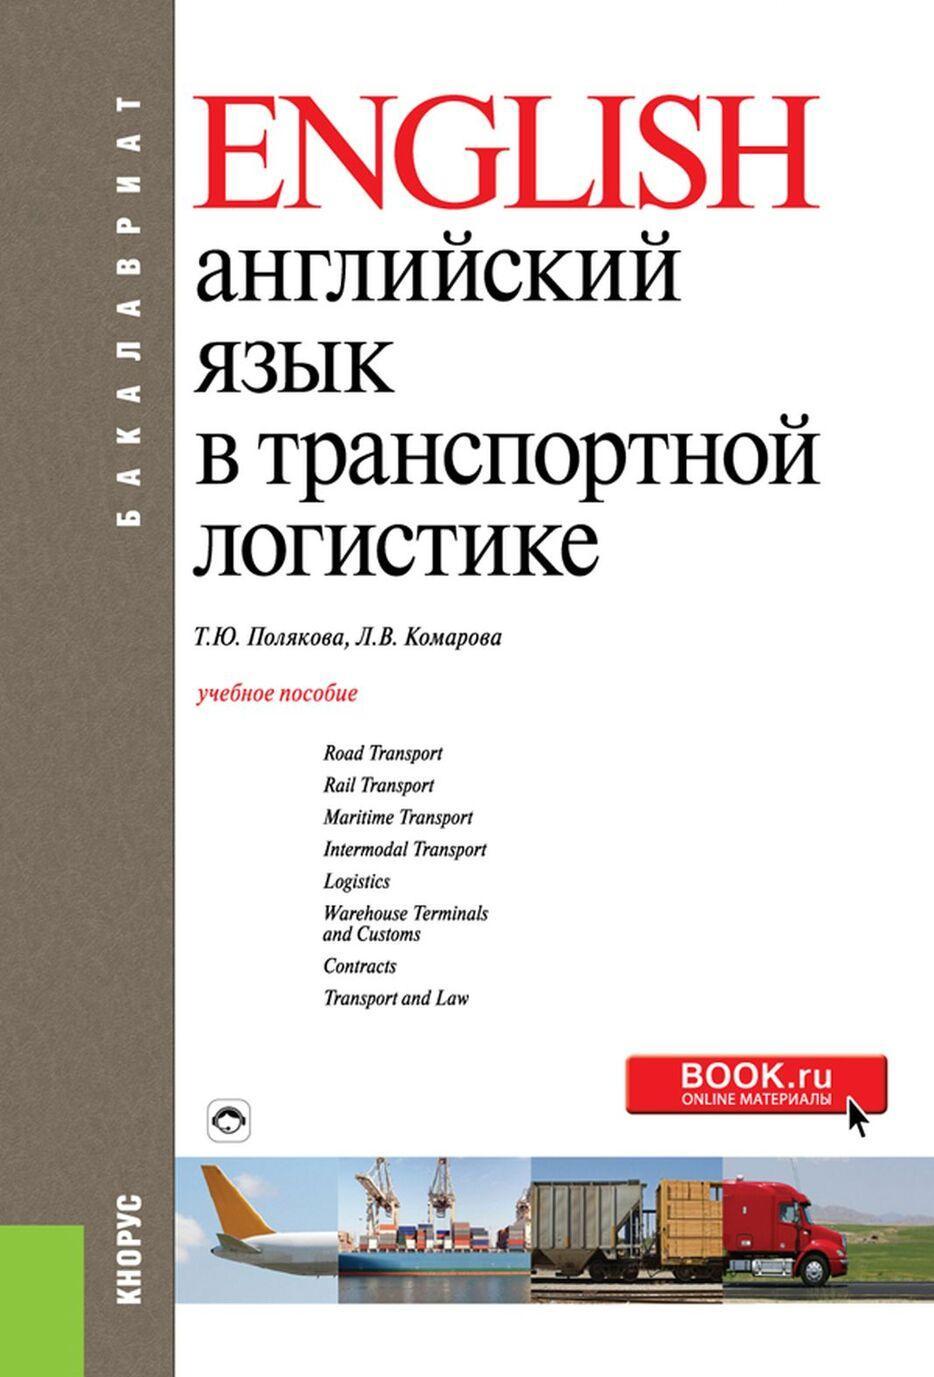 Anglijskij jazyk v transportnoj logistike. Uchebnoe posobie | Poljakova Tatjana Jurevna, Komarova Ljudmila Viktorovna